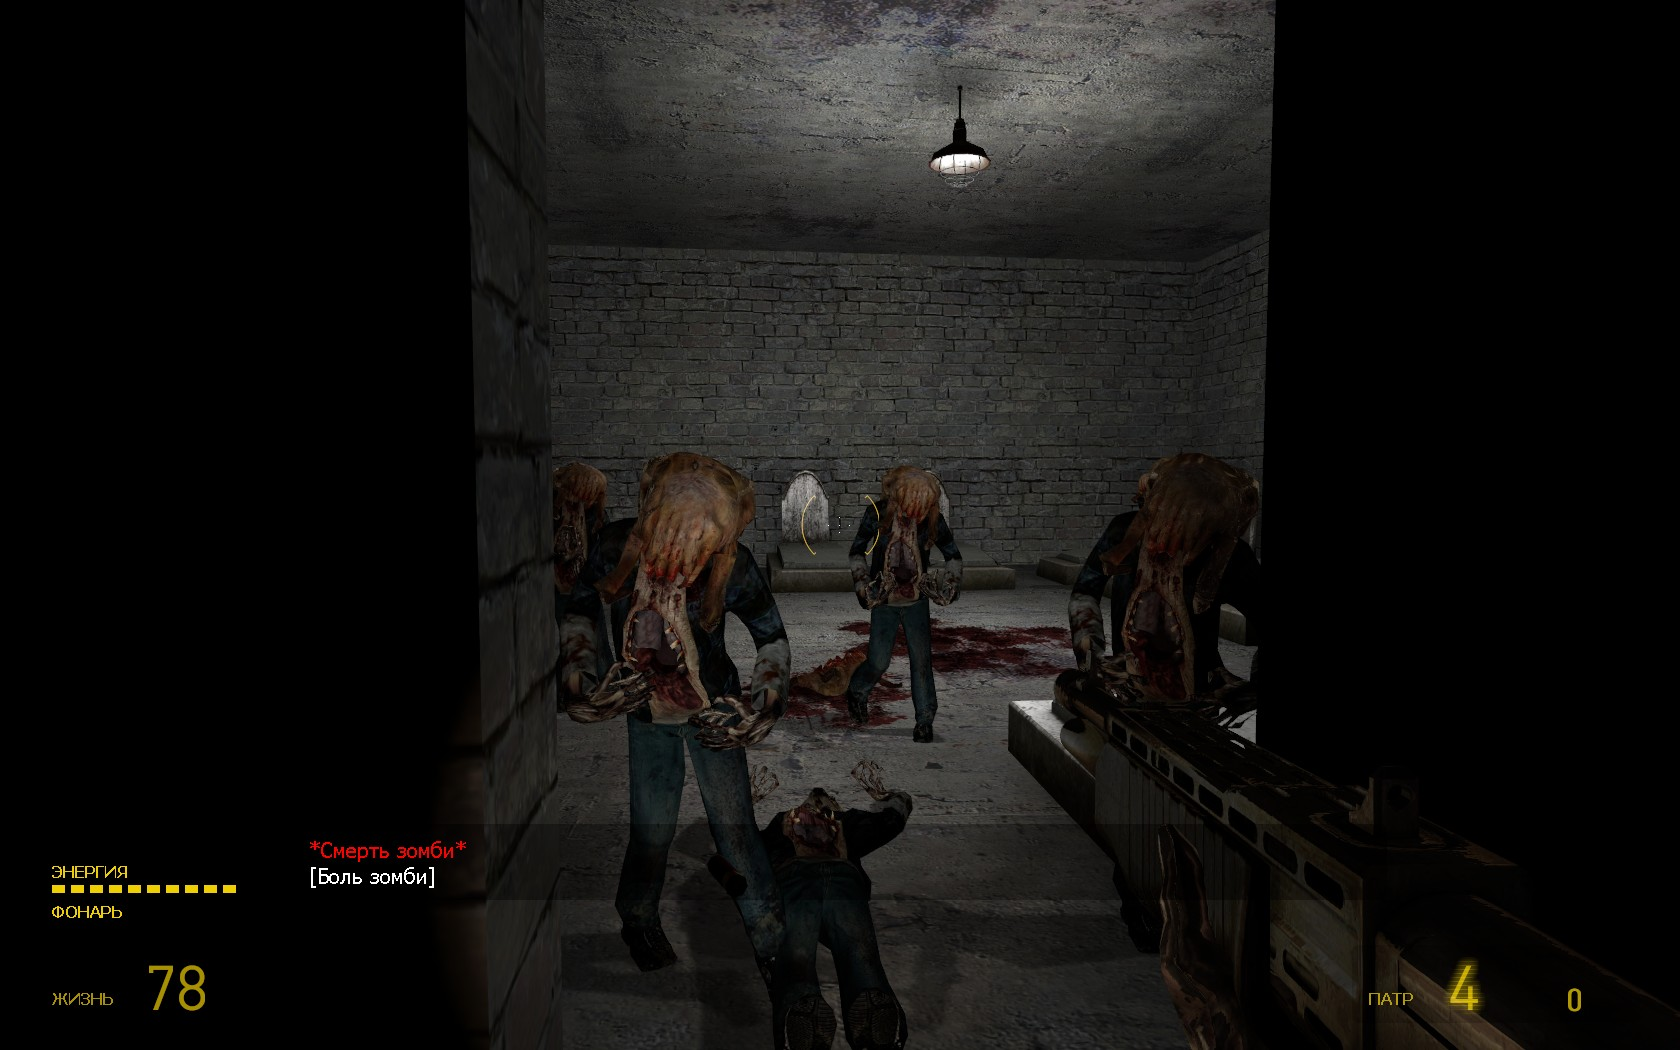 ravenholmlc3_tomb0012 - Half-Life 2 ravenholmlc3_tomb0012